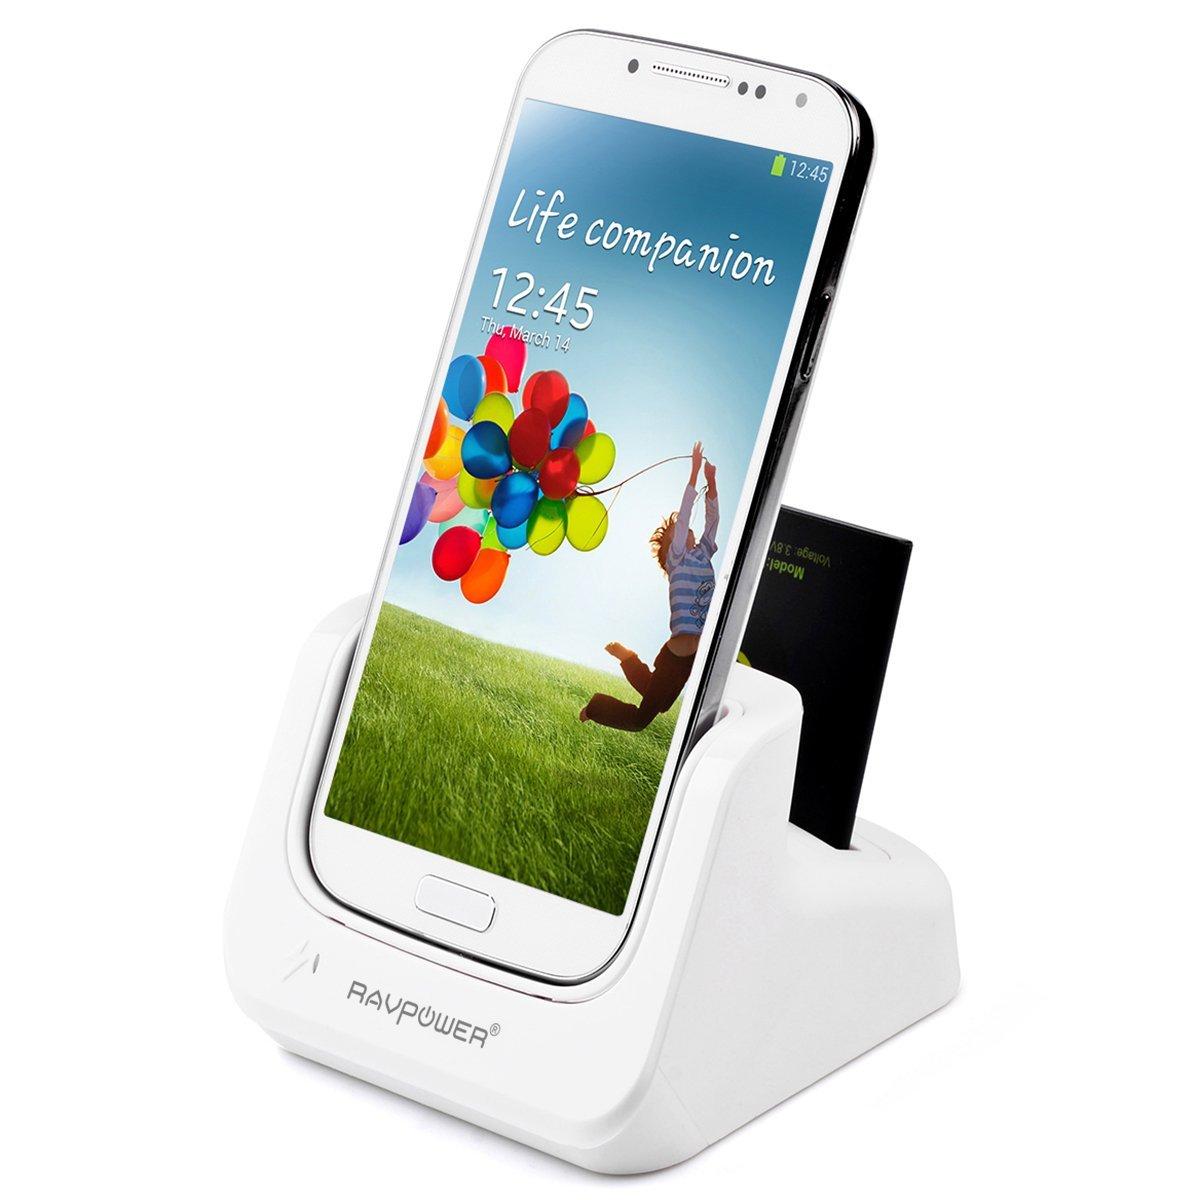 station d'accueil Galaxy S4 ou S5